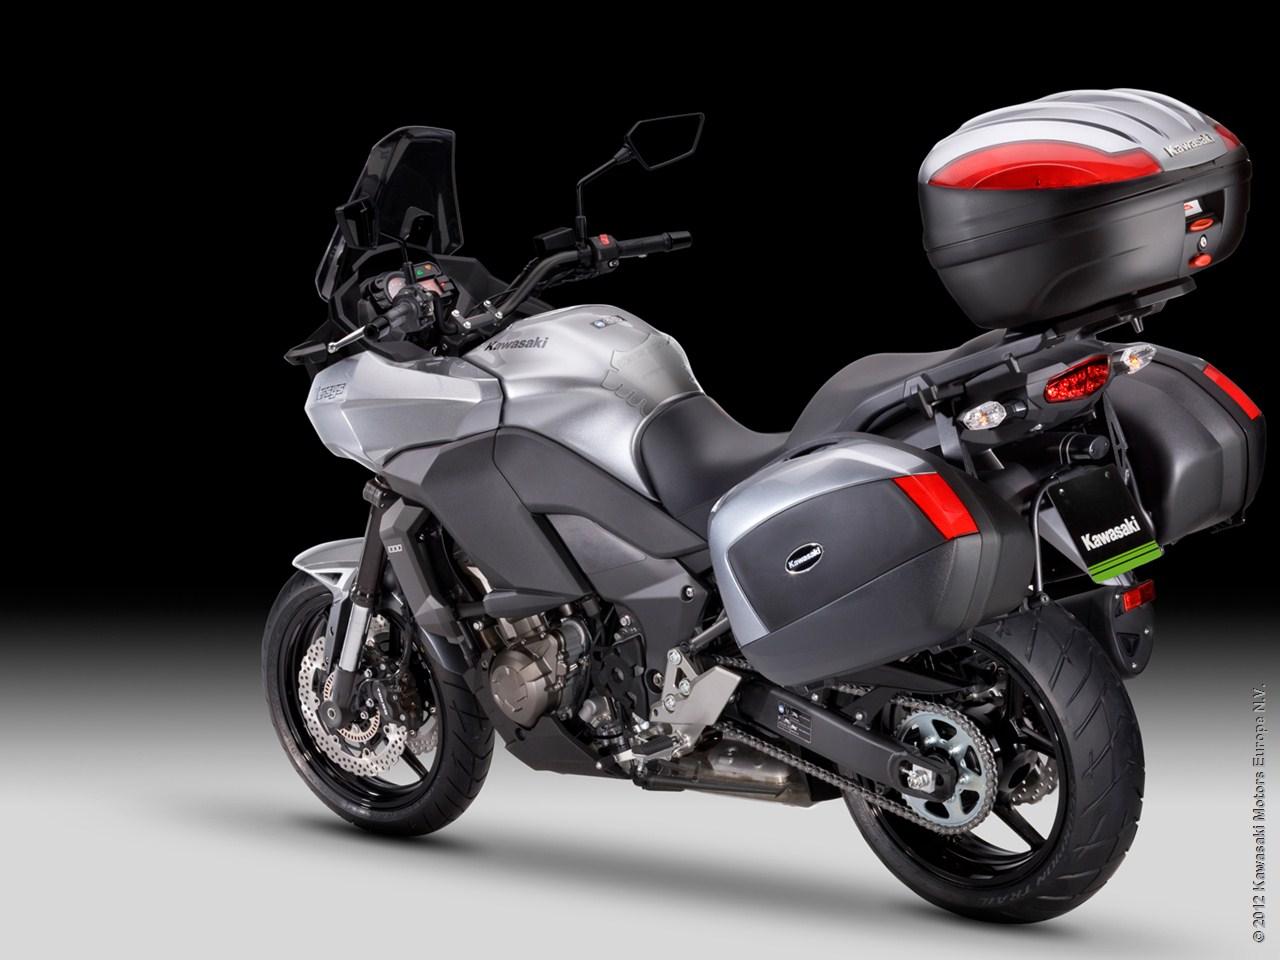 2013 Kawasaki Versys 1000 Grand Tourer Shows Nifty Accessories Autoevolution